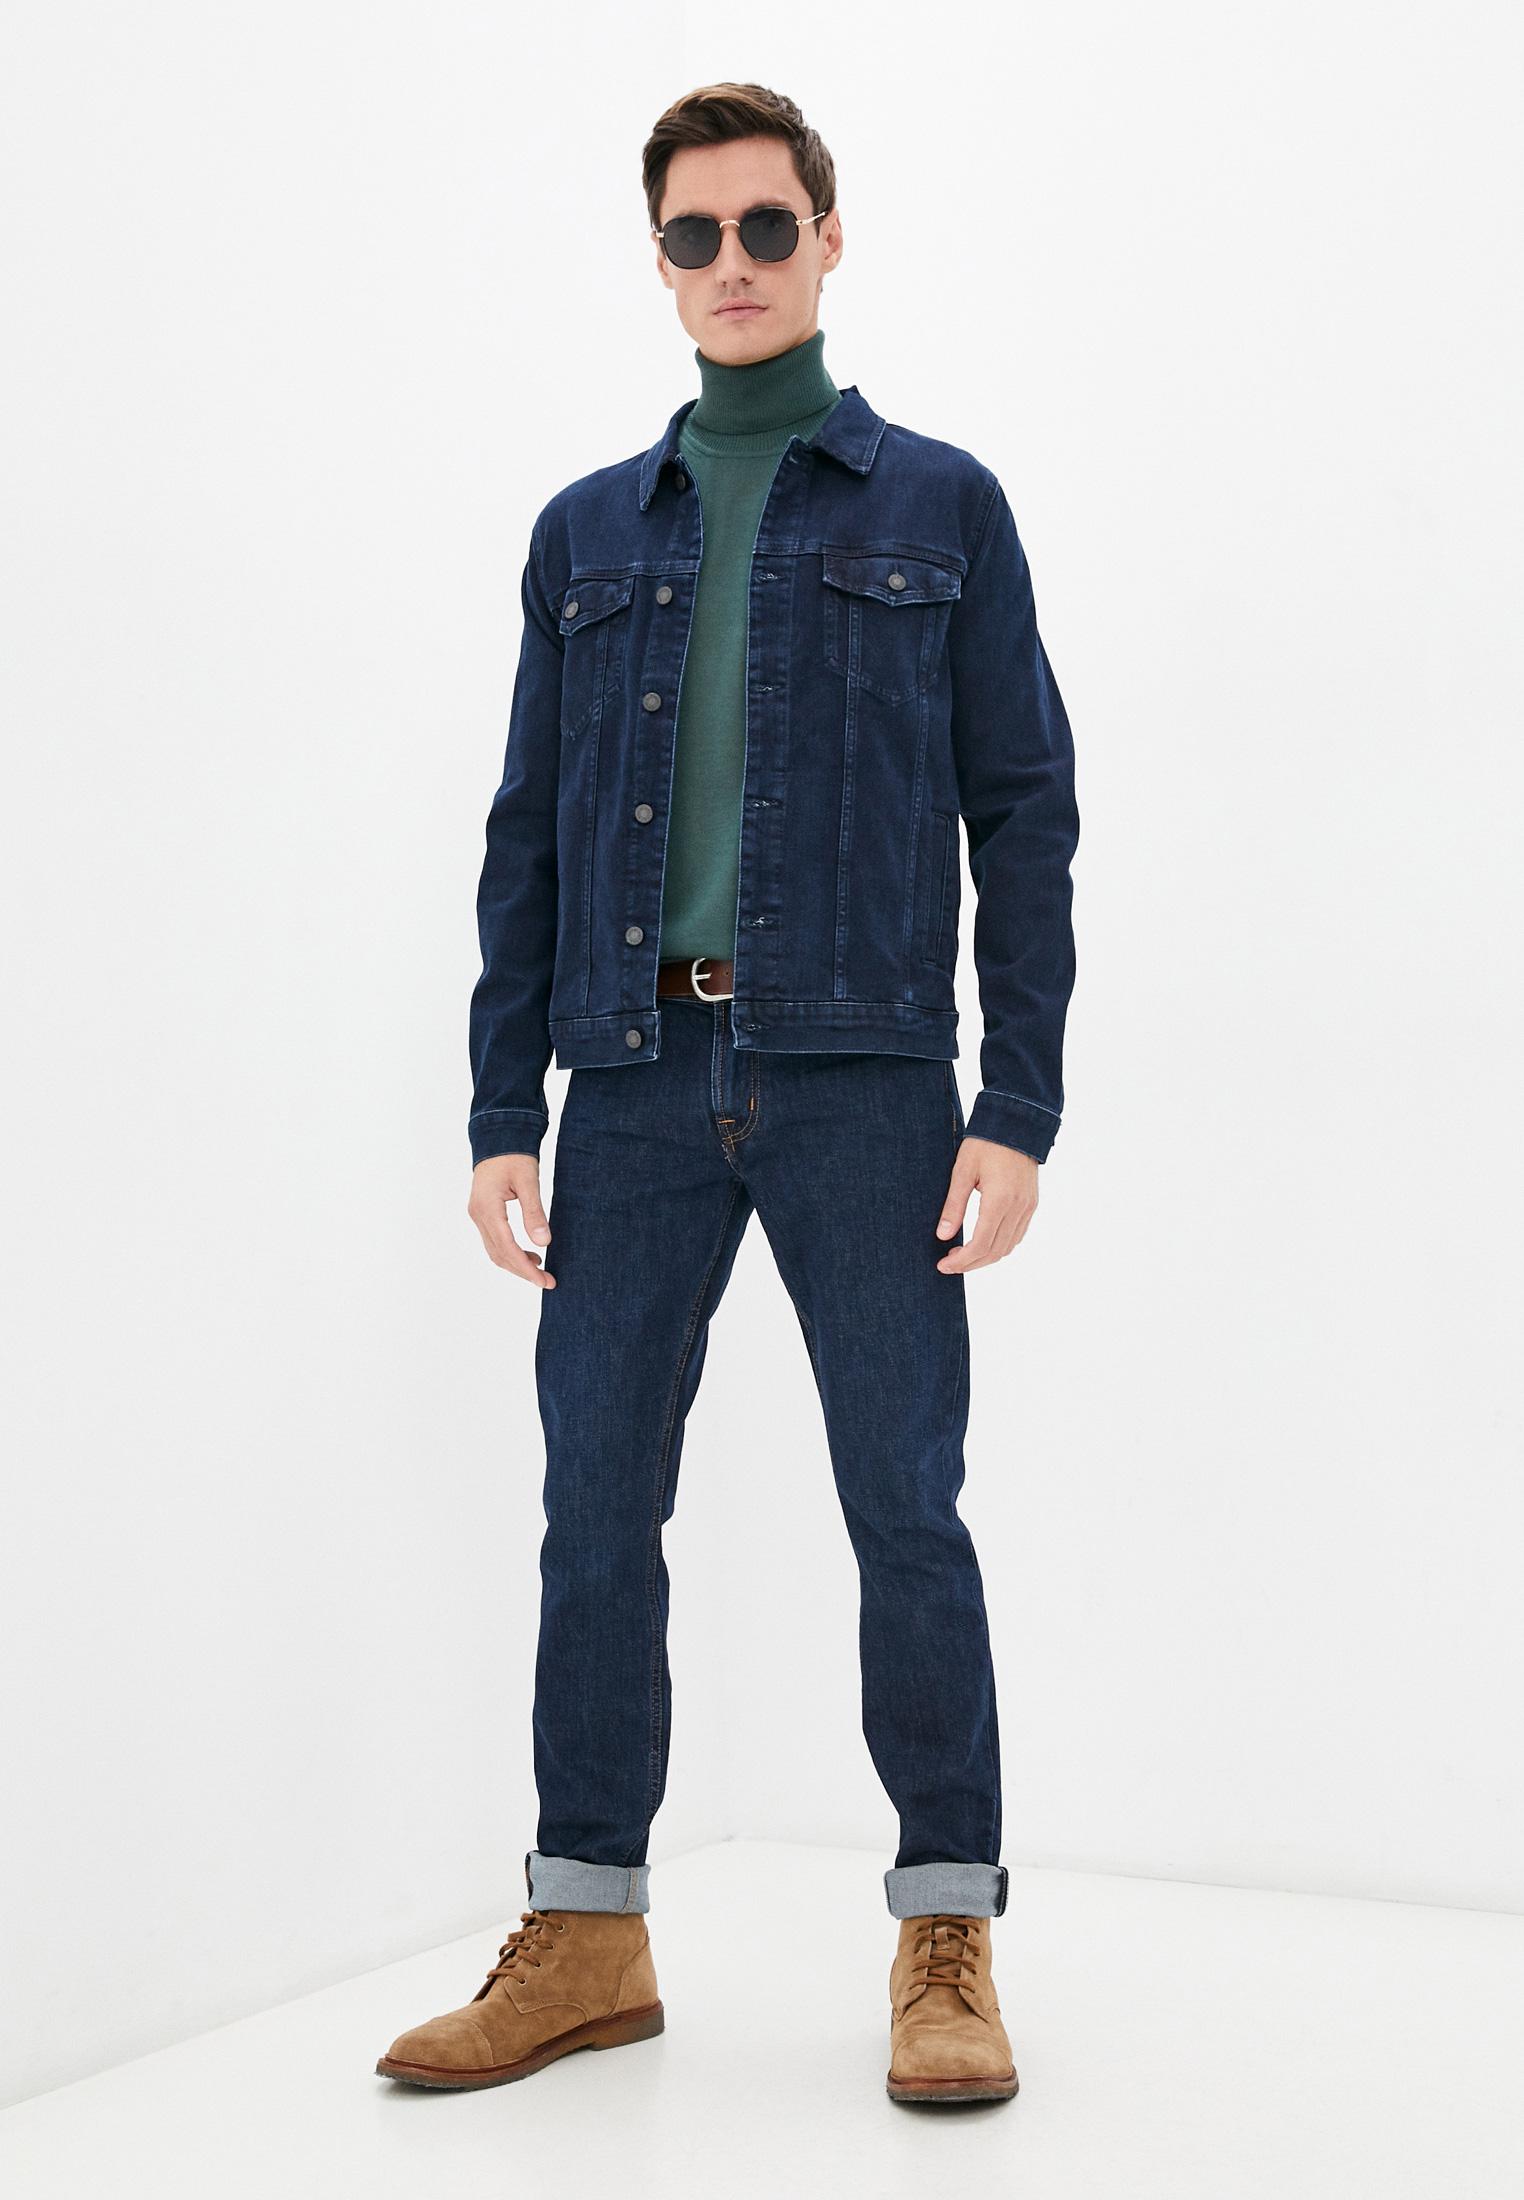 Джинсовая куртка 7 For All Mankind (7 Фо Олл Мэнкайнд) JSK5R460LL: изображение 3